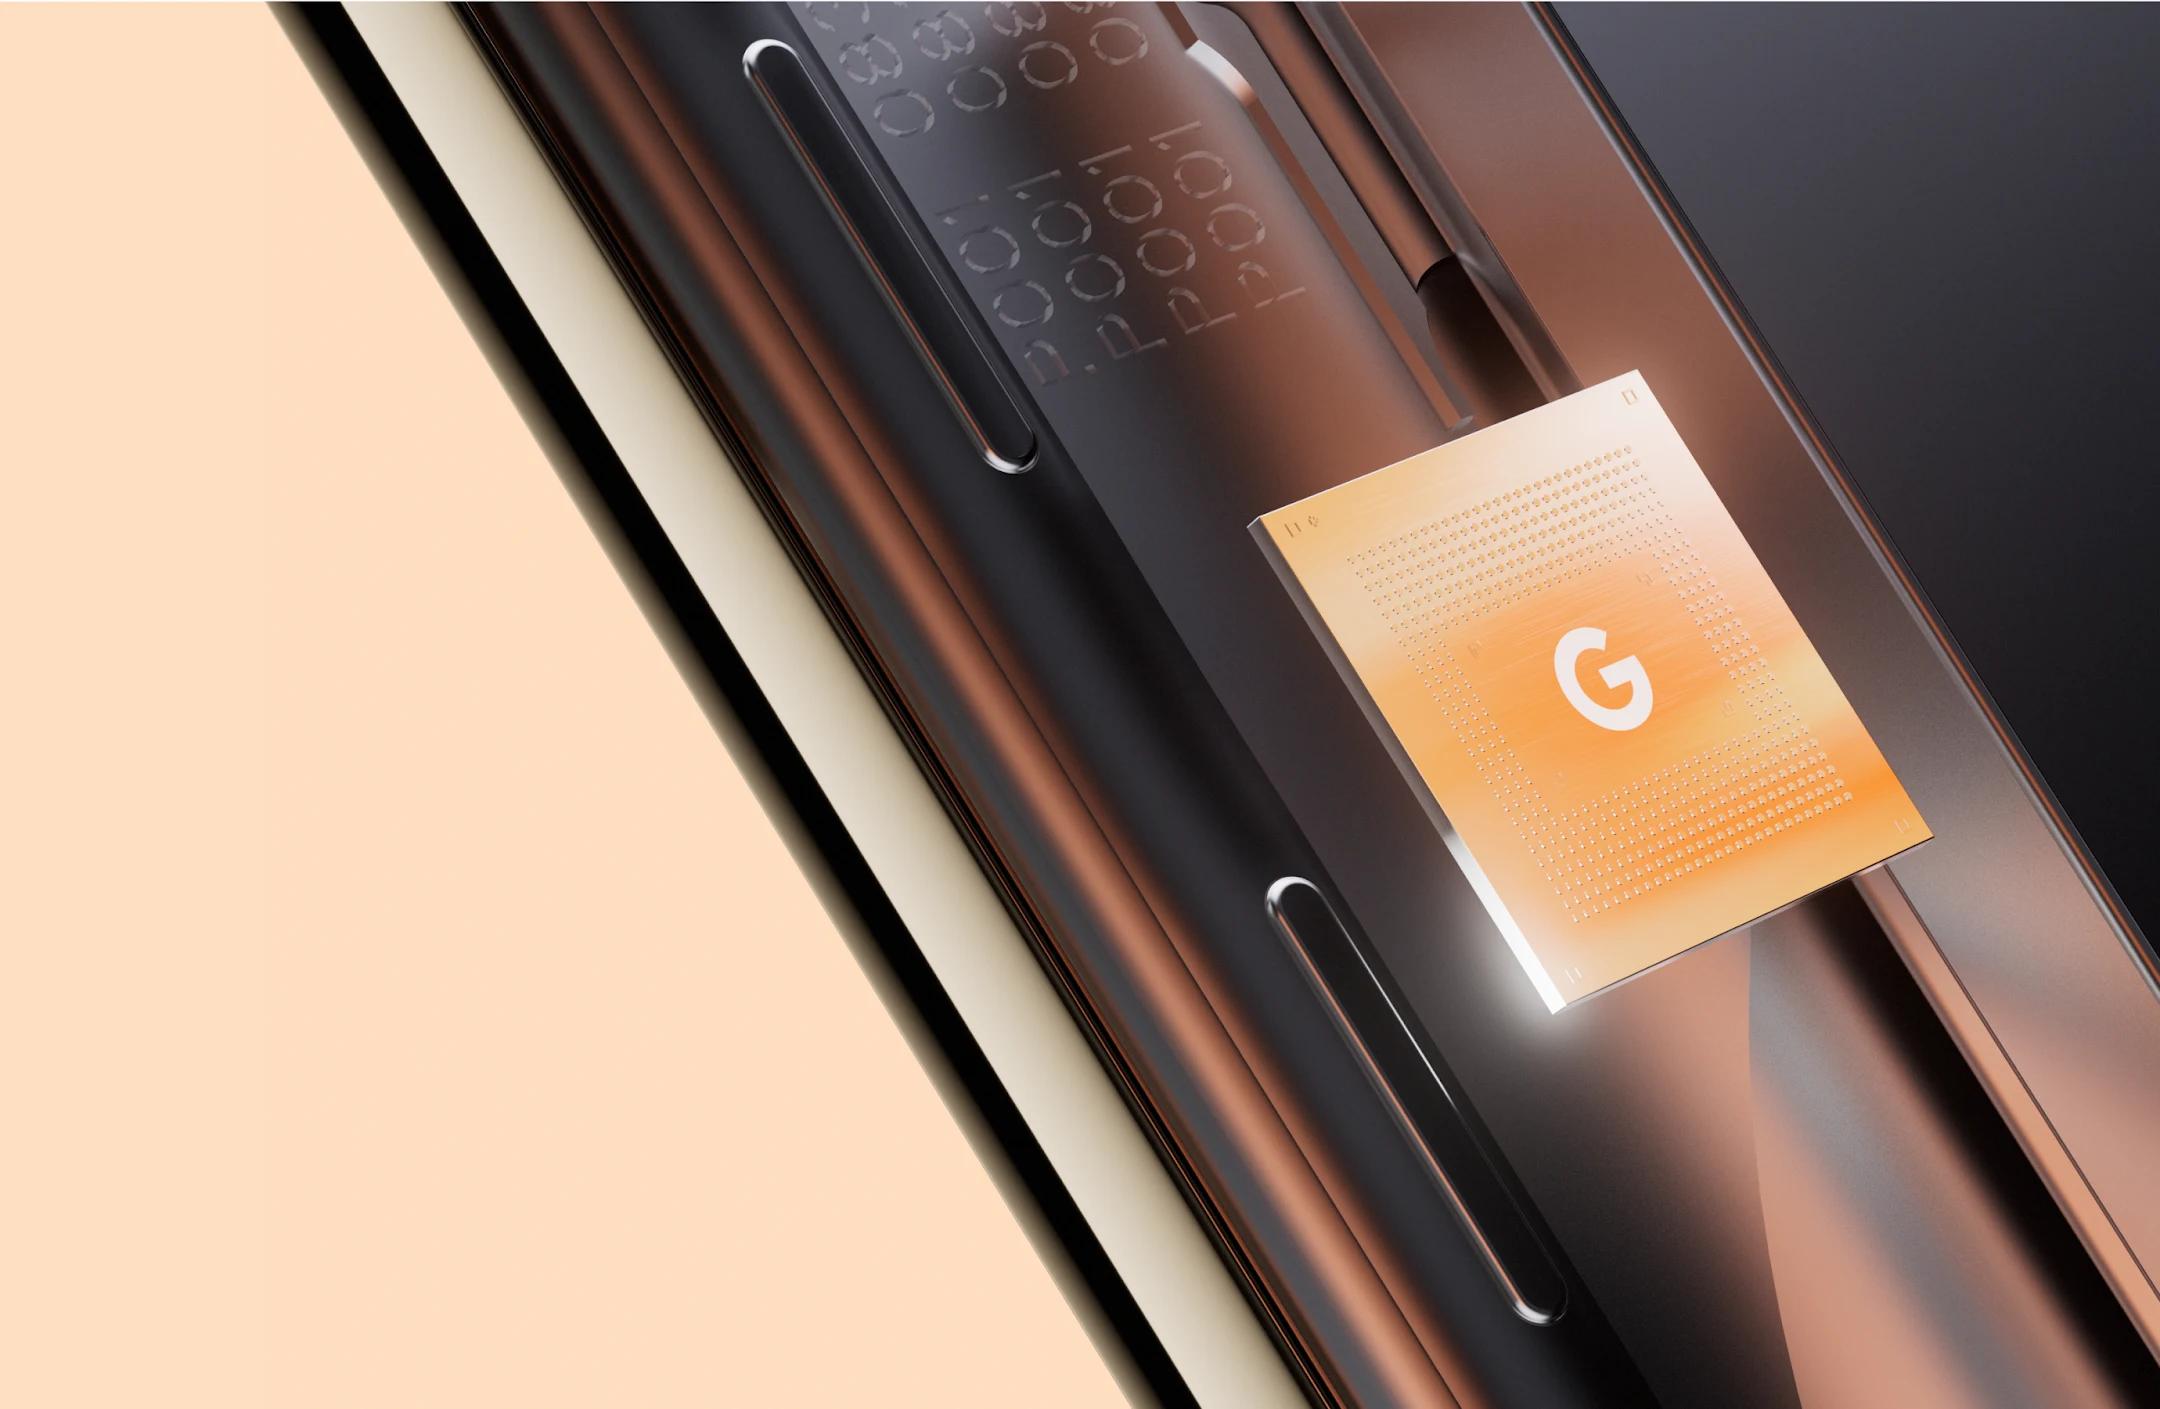 Google Tensor' is Made by Google 'Whitechapel' processor - 9to5Google